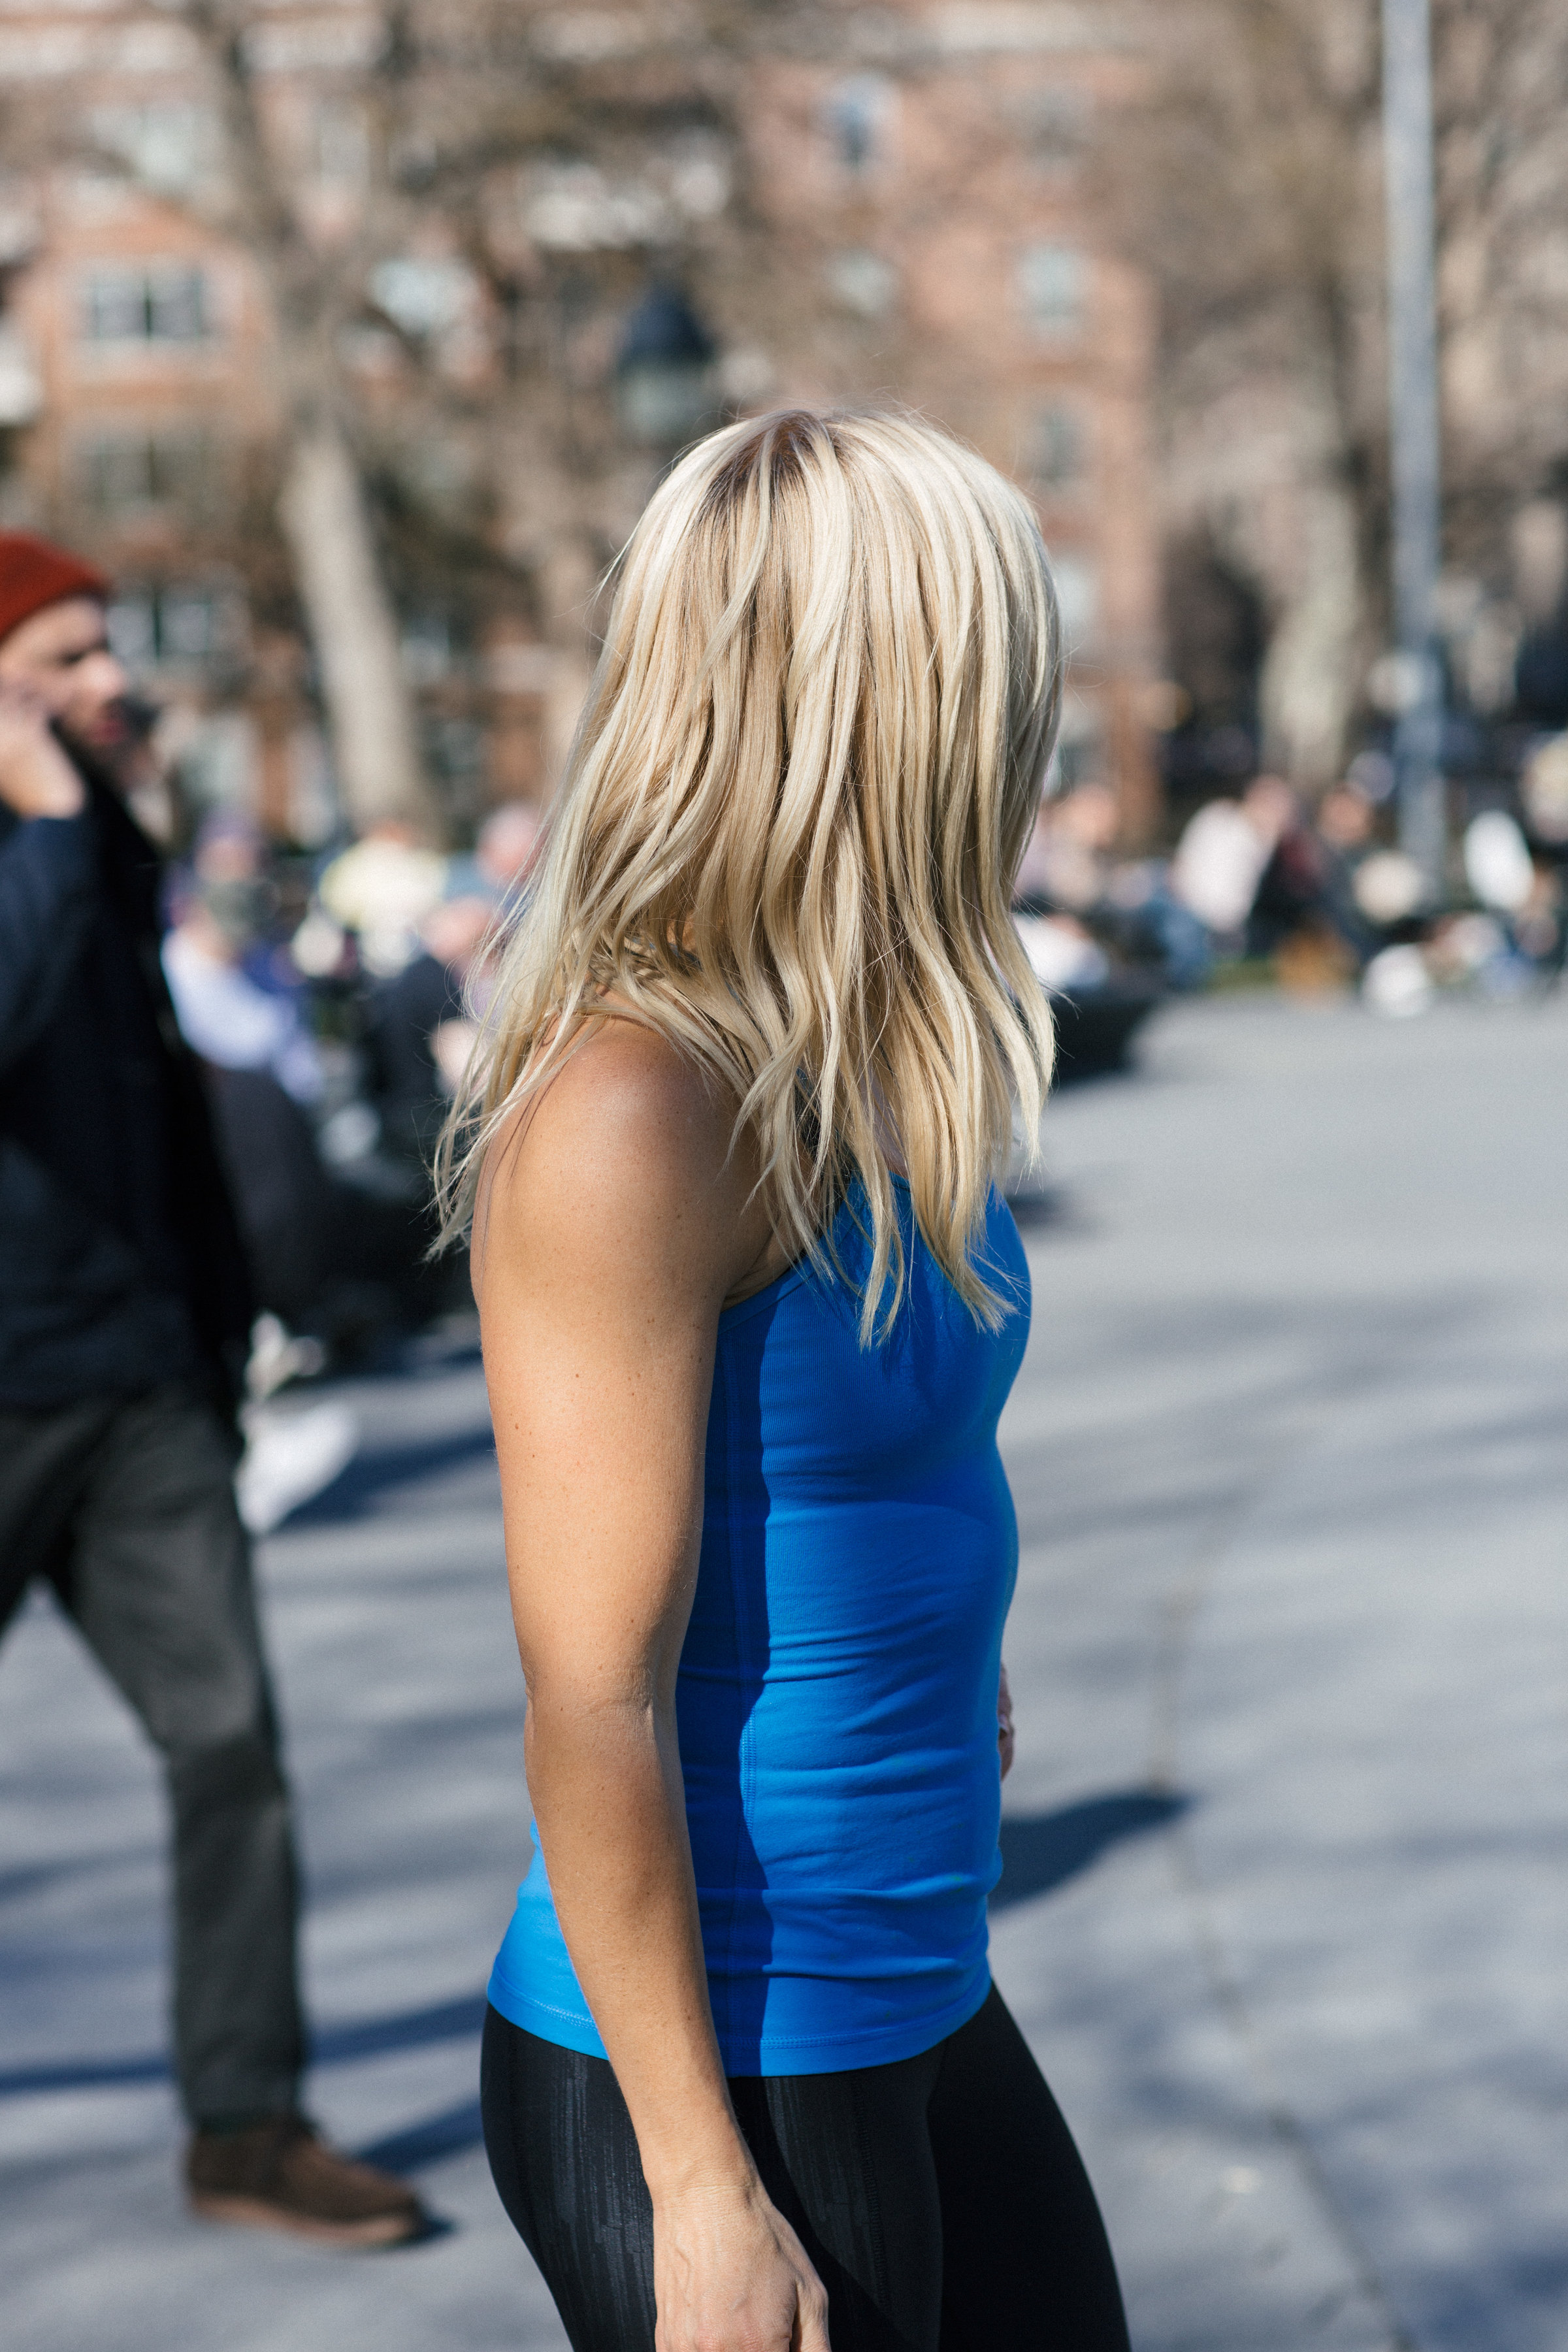 Anna Kooiman Washington Square Park New York City Fitness Fashion Lydia Hudgens